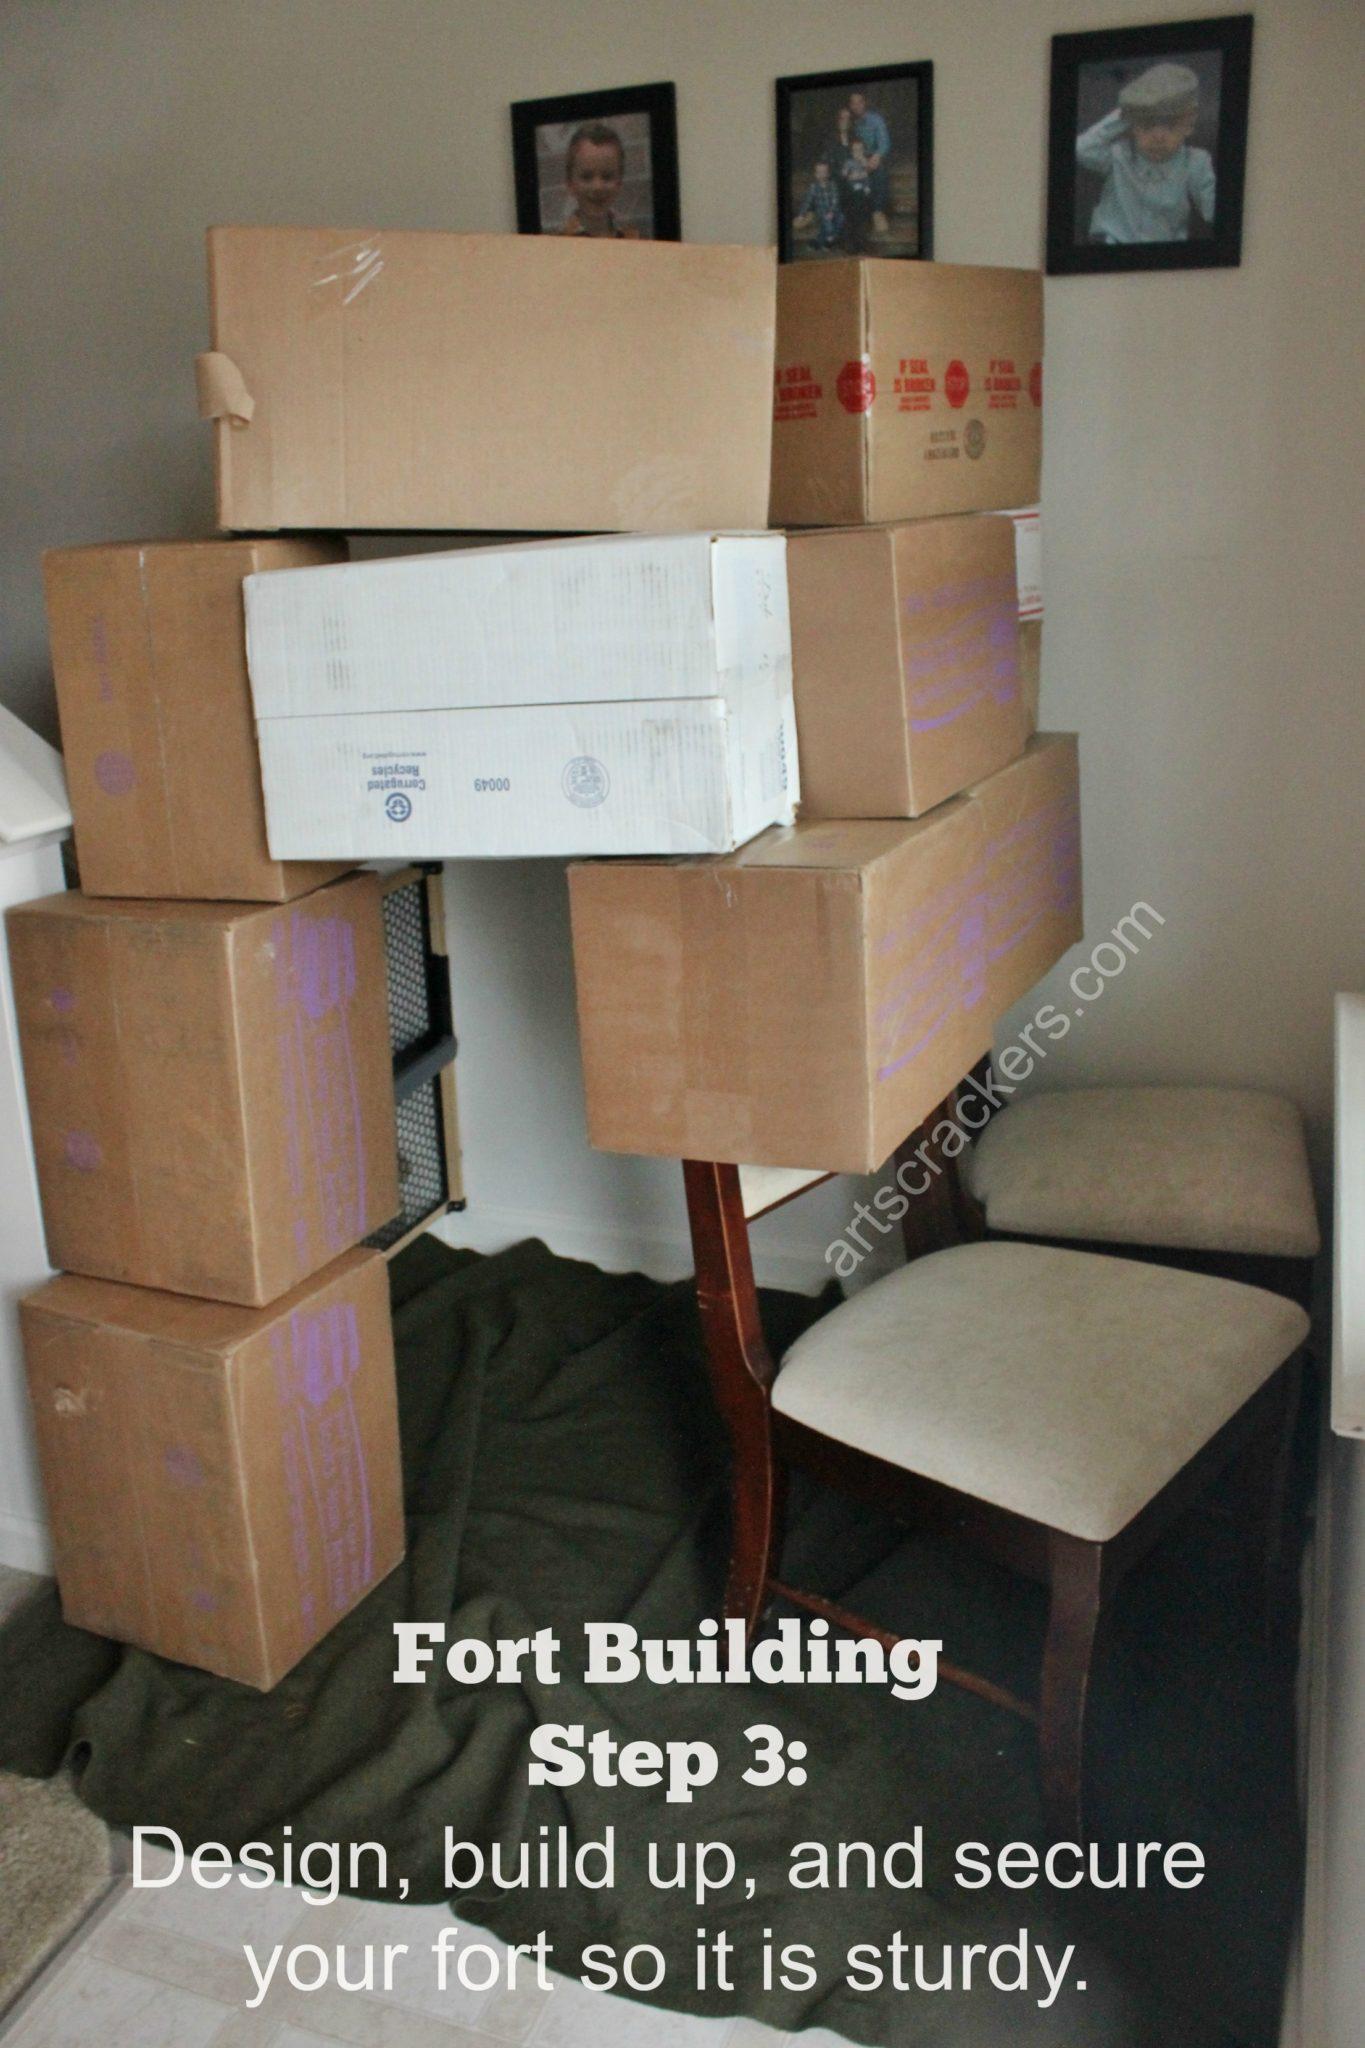 Fort Building Step 3